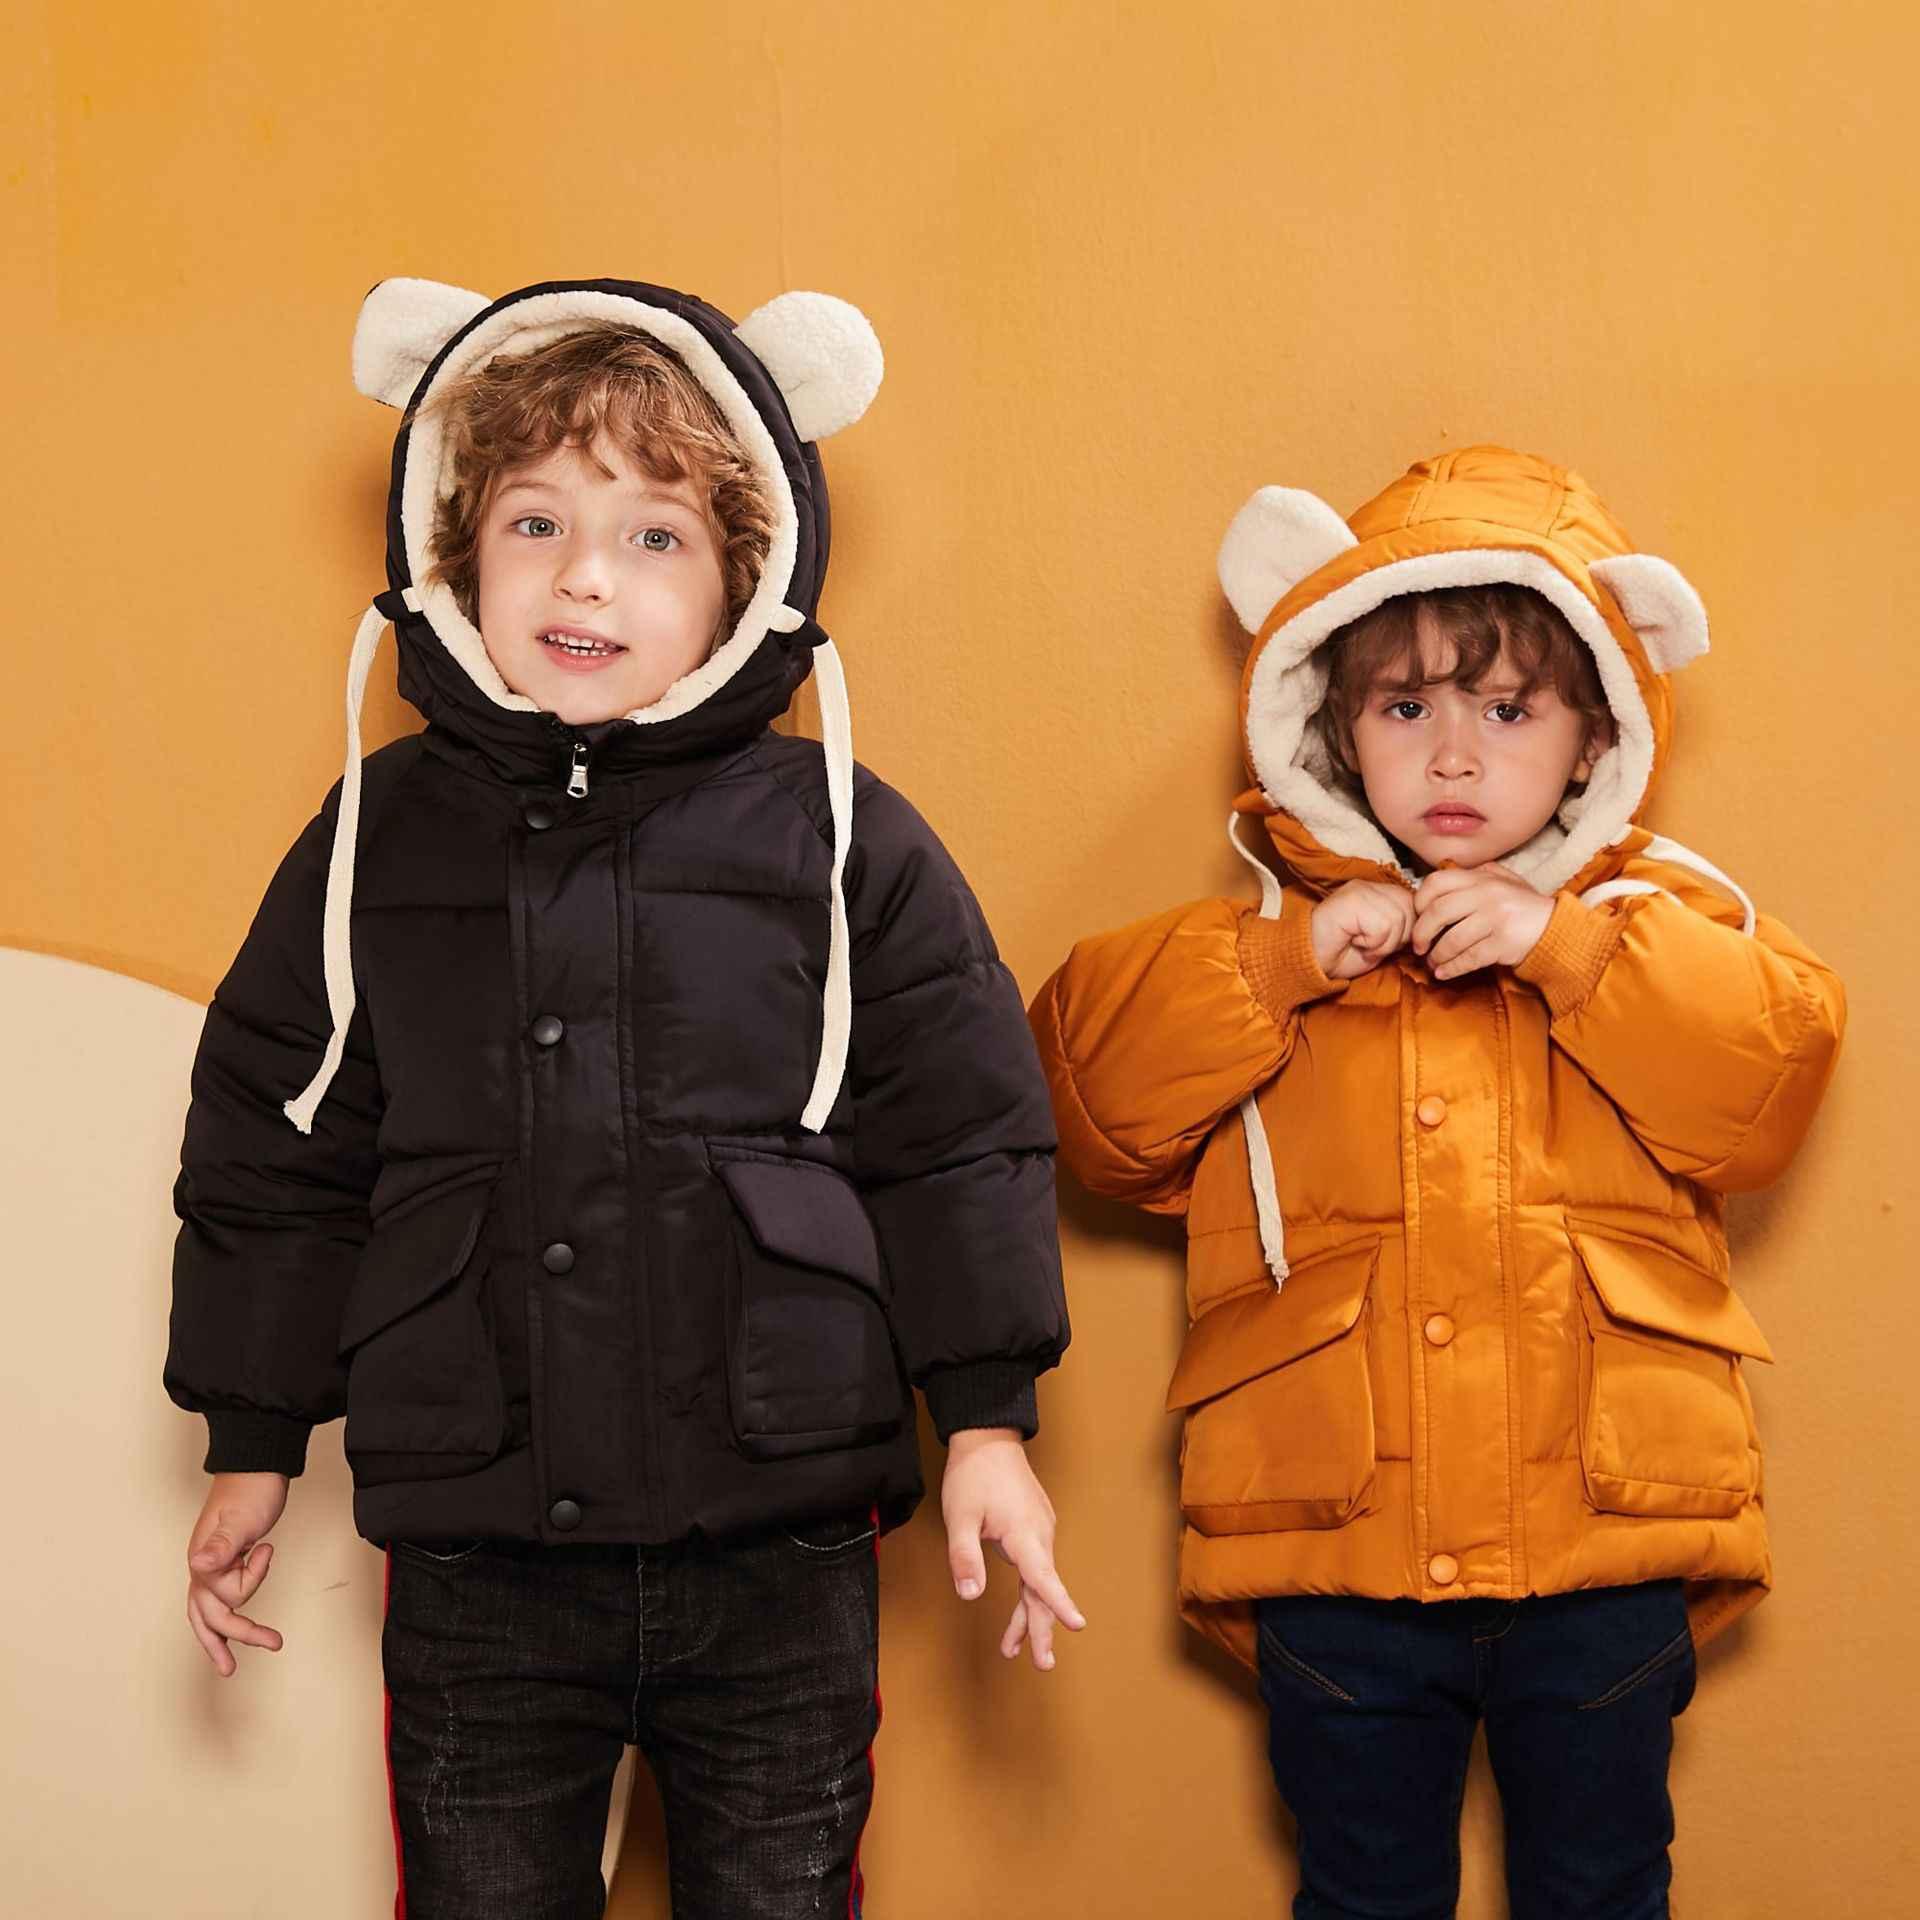 Oeak 2020 חורף חם מעילי תינוק בנות בגדי ילדי מעילי כותנה ברדס להאריך ימים יותר מעיל בני בנות בגדים